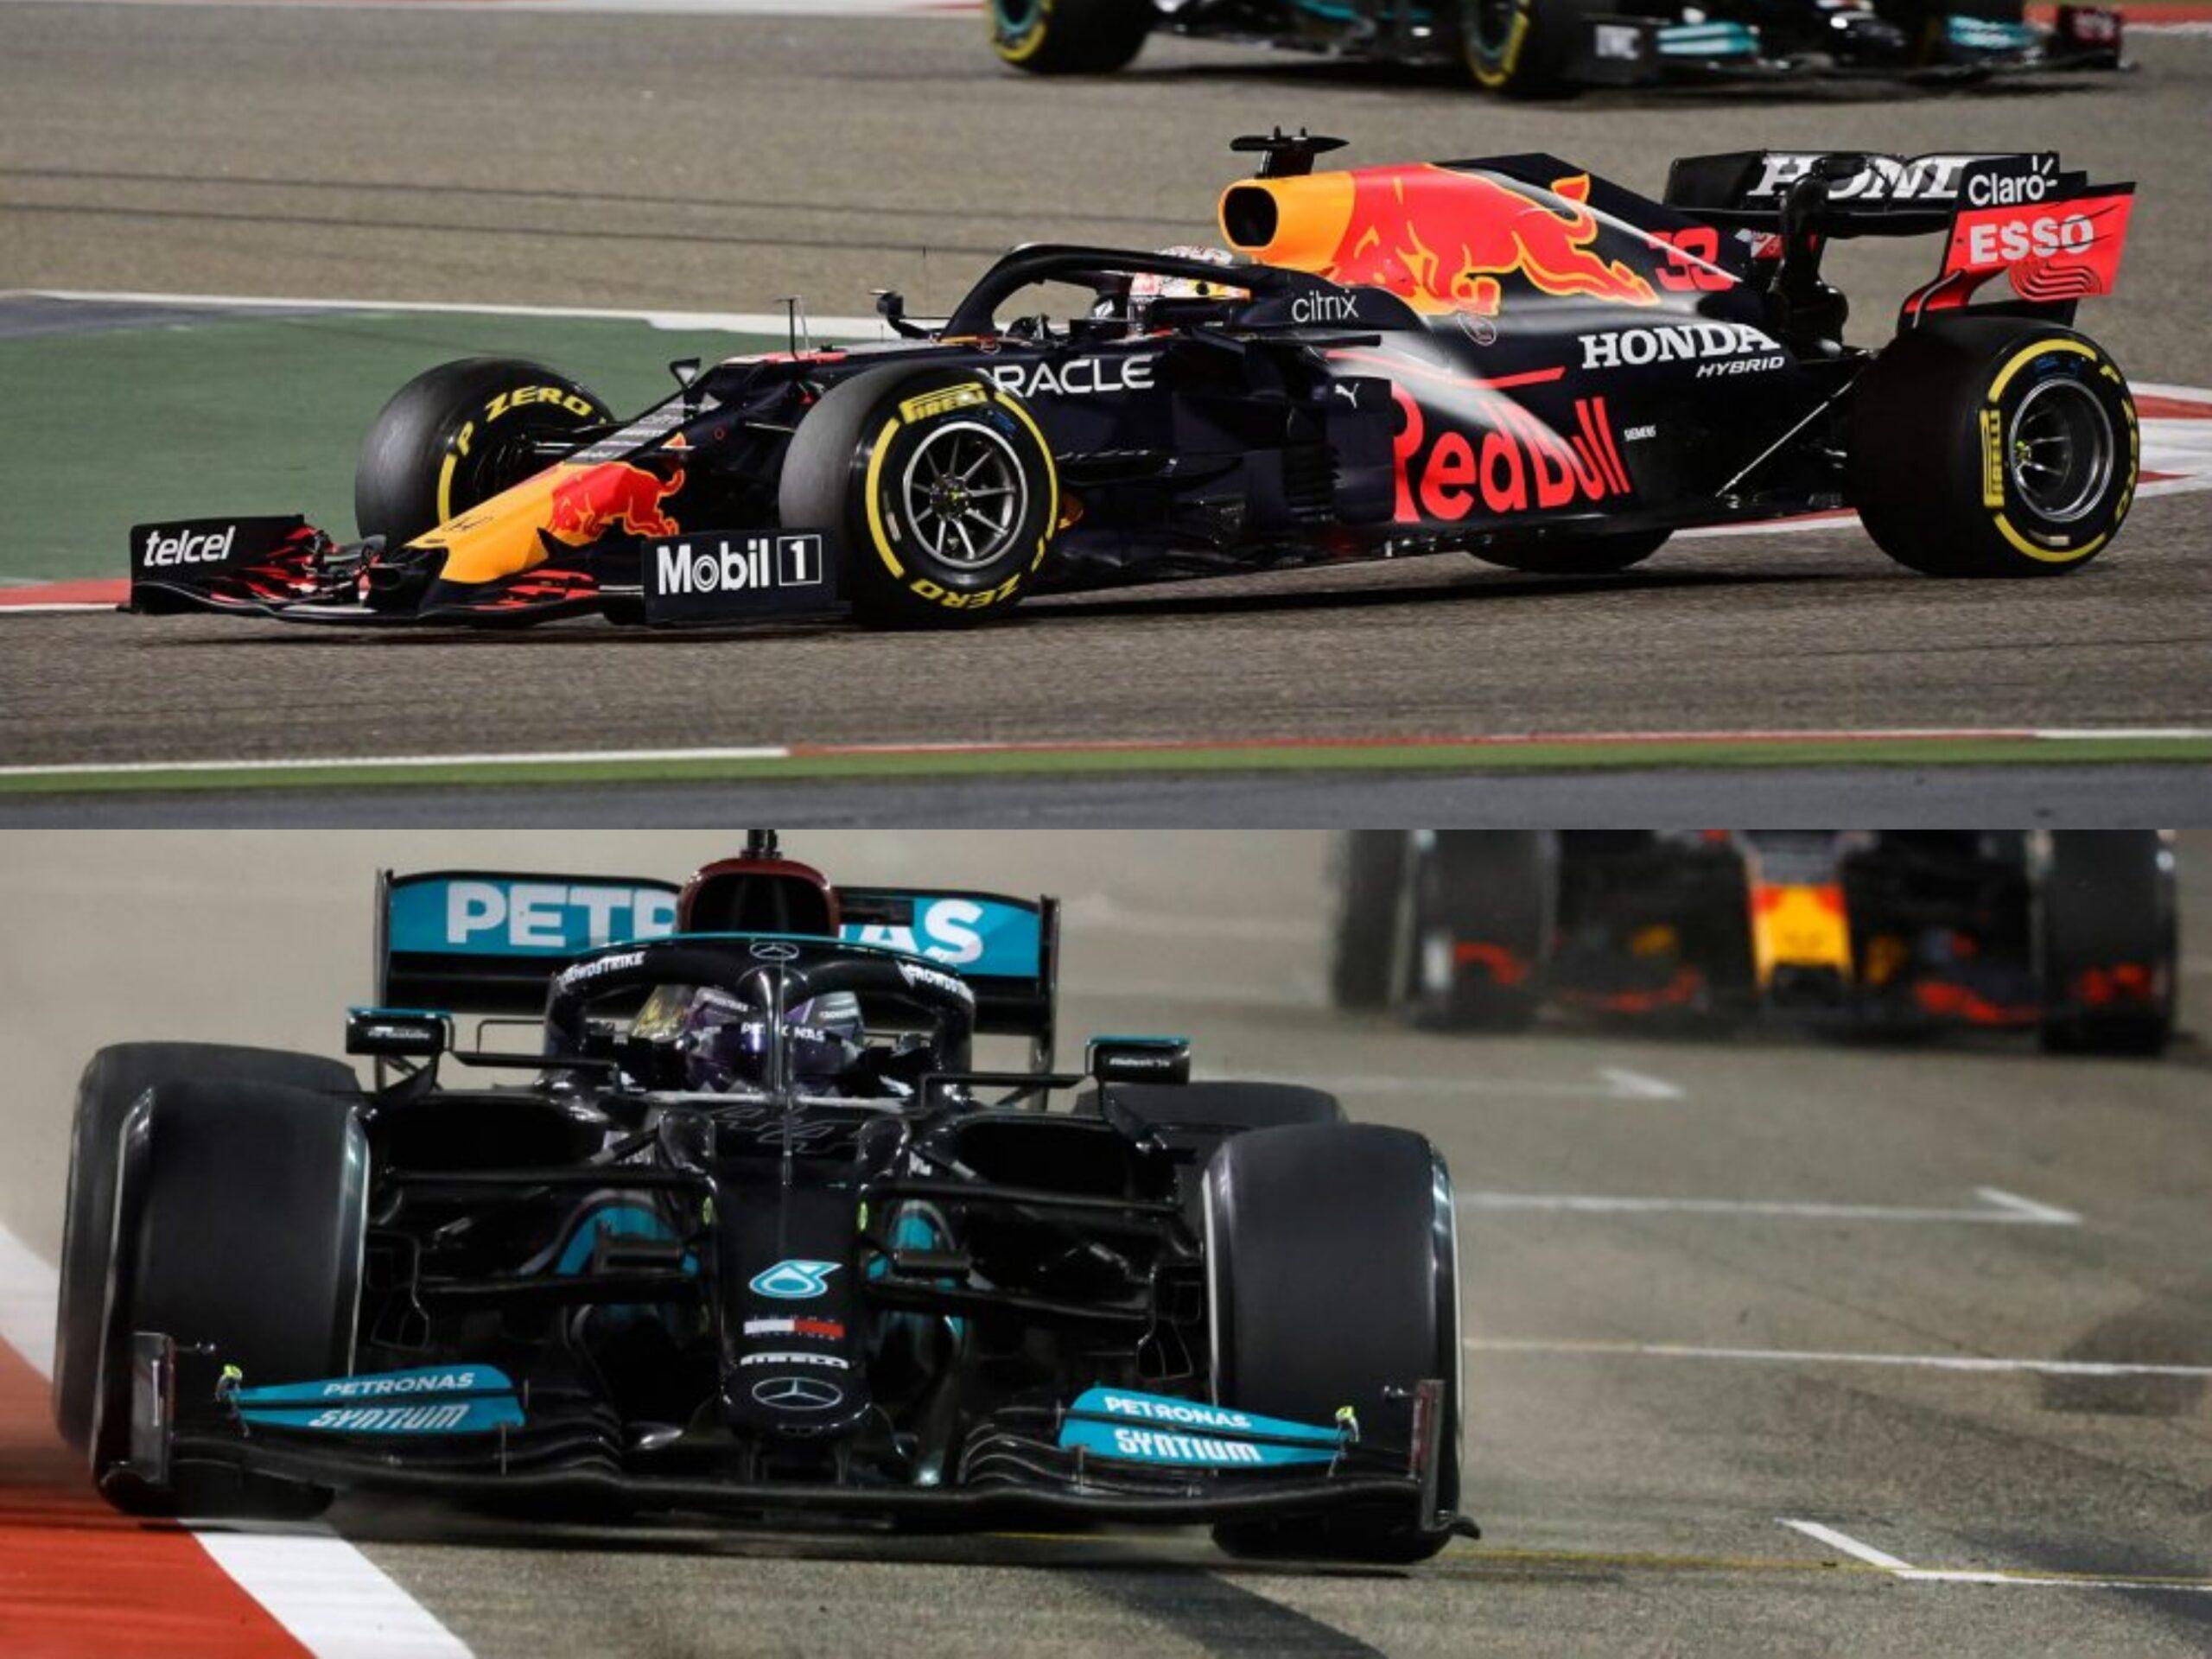 Parliamo di… Lewis Hamilton o Max Verstappen?